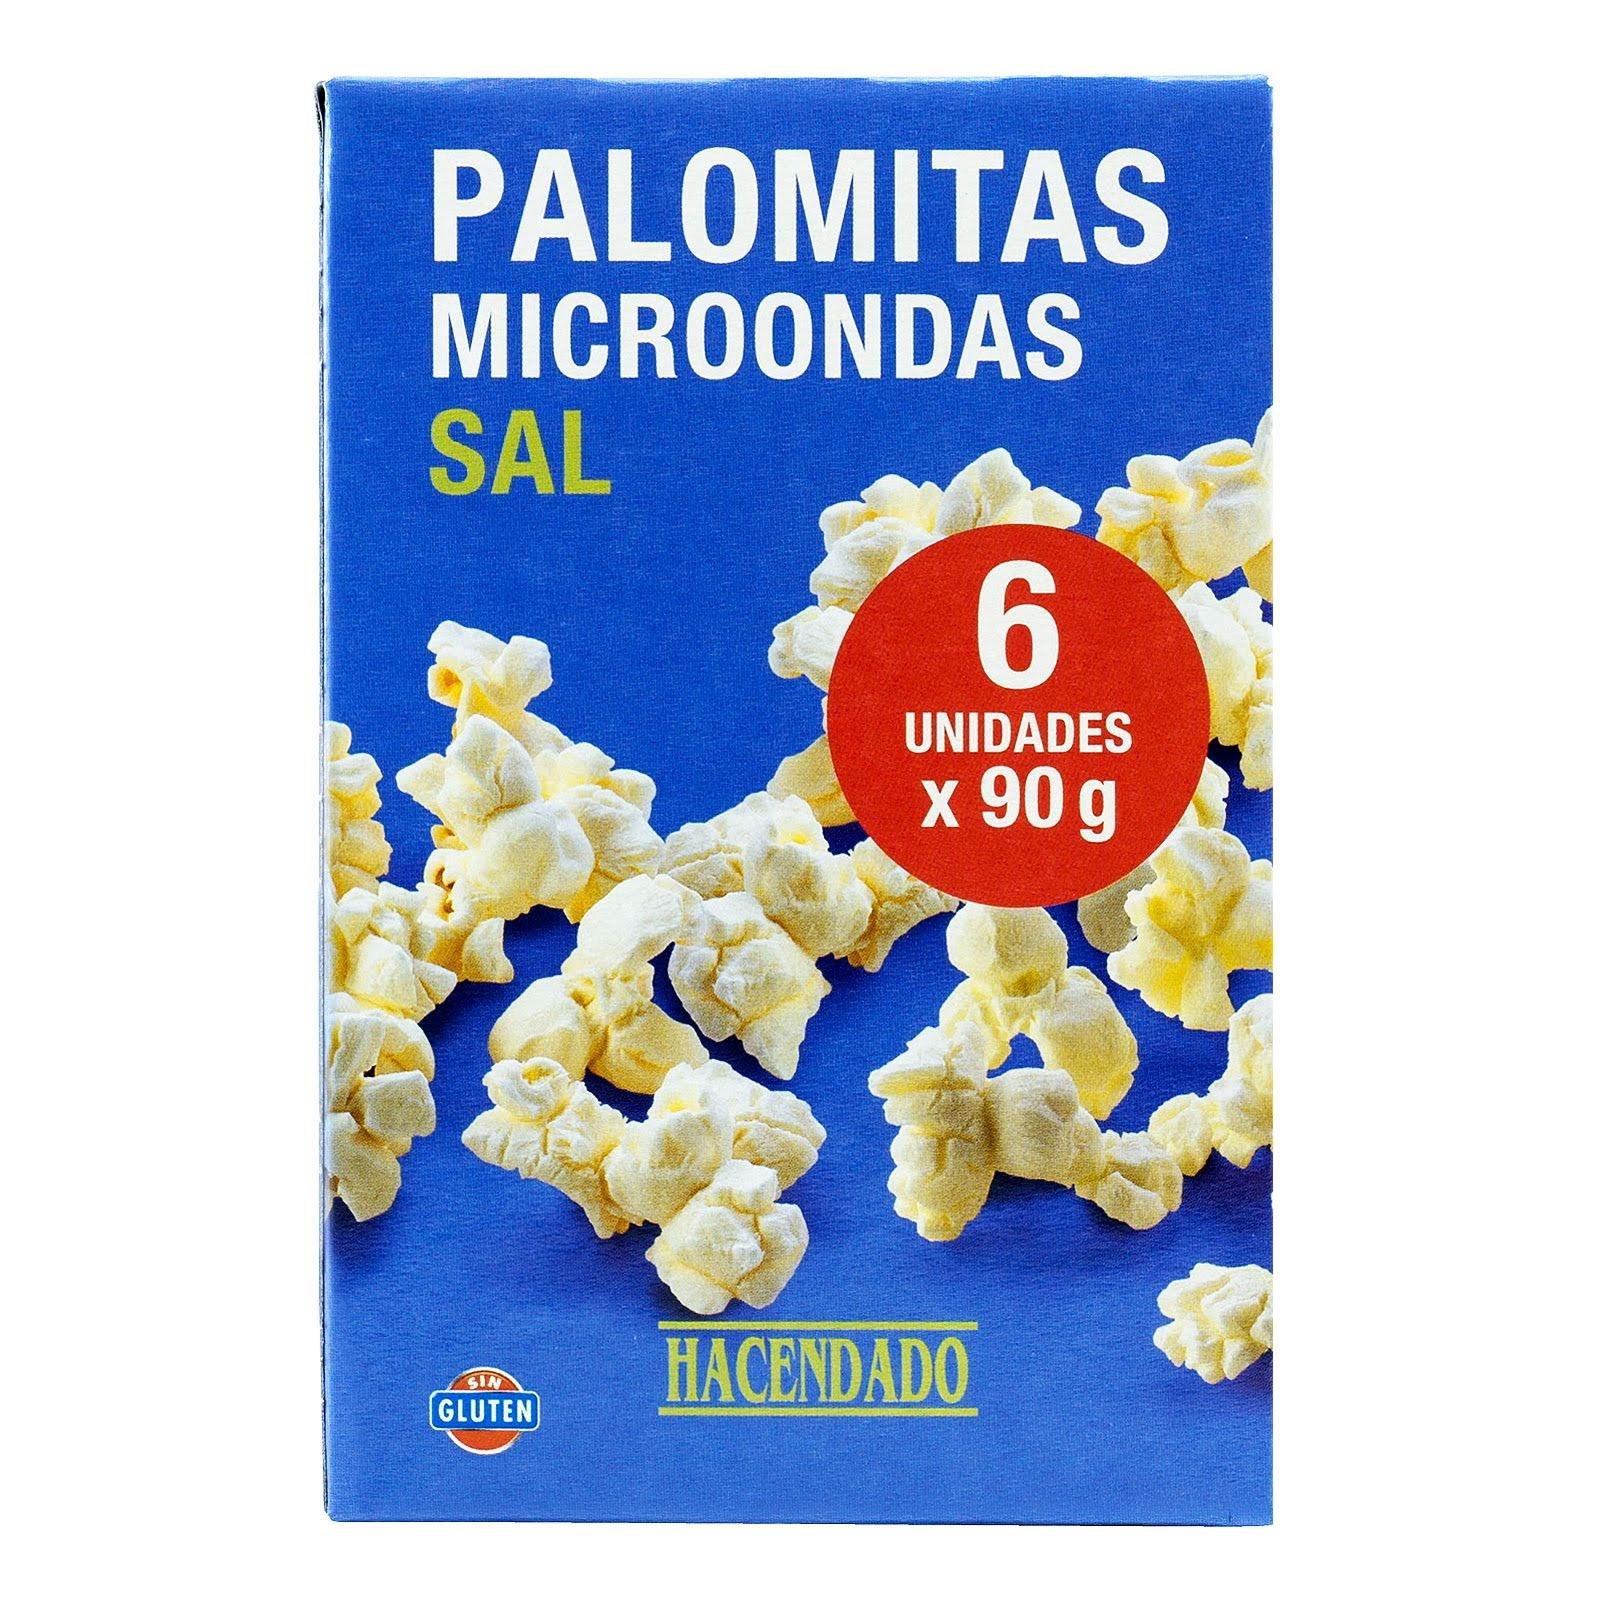 Palomitas de maíz con sal para microondas Hacendado